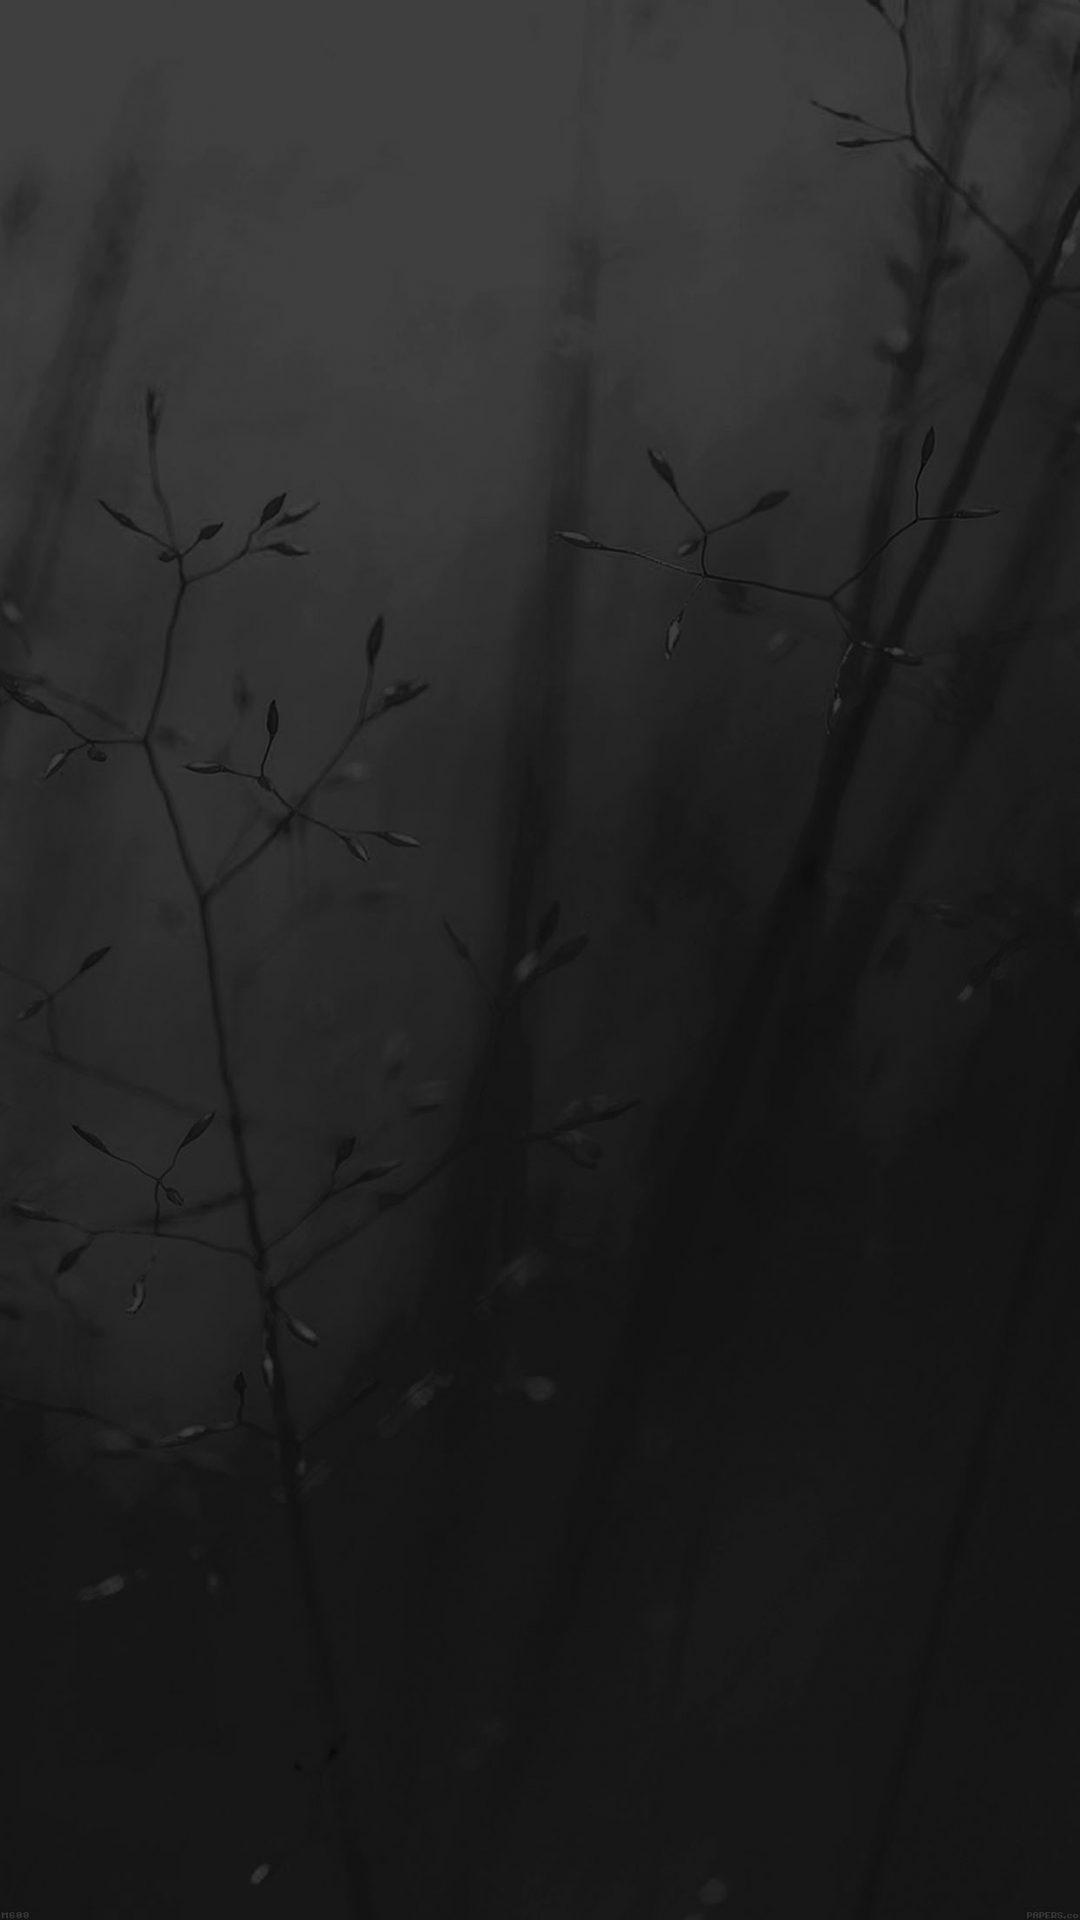 LG G3 Weed Dark Flower Nature